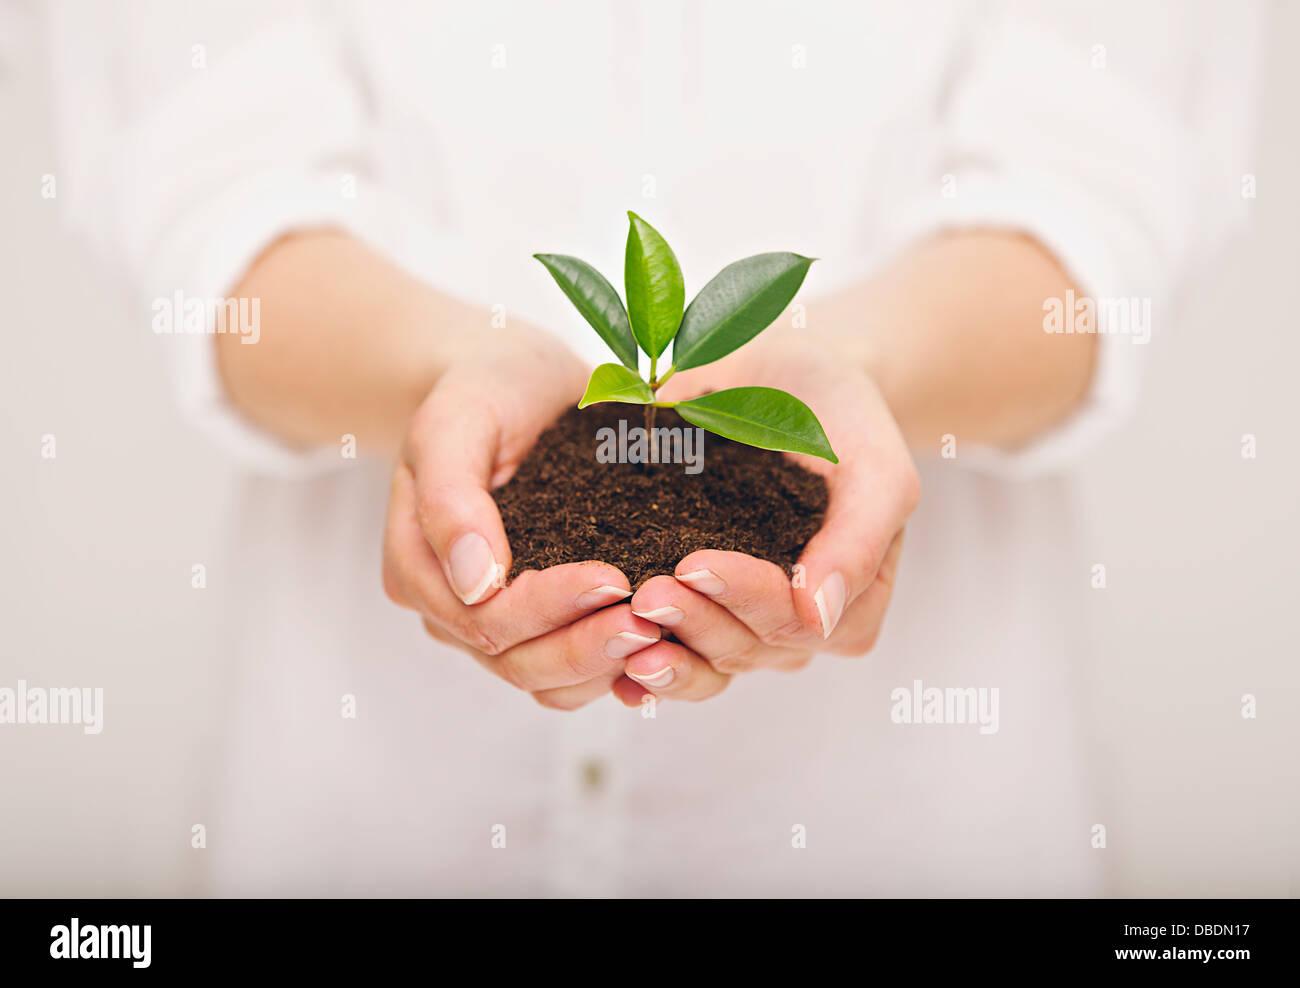 Frau die Hand, die junge Pflanze, Ökologie-Konzept Stockbild